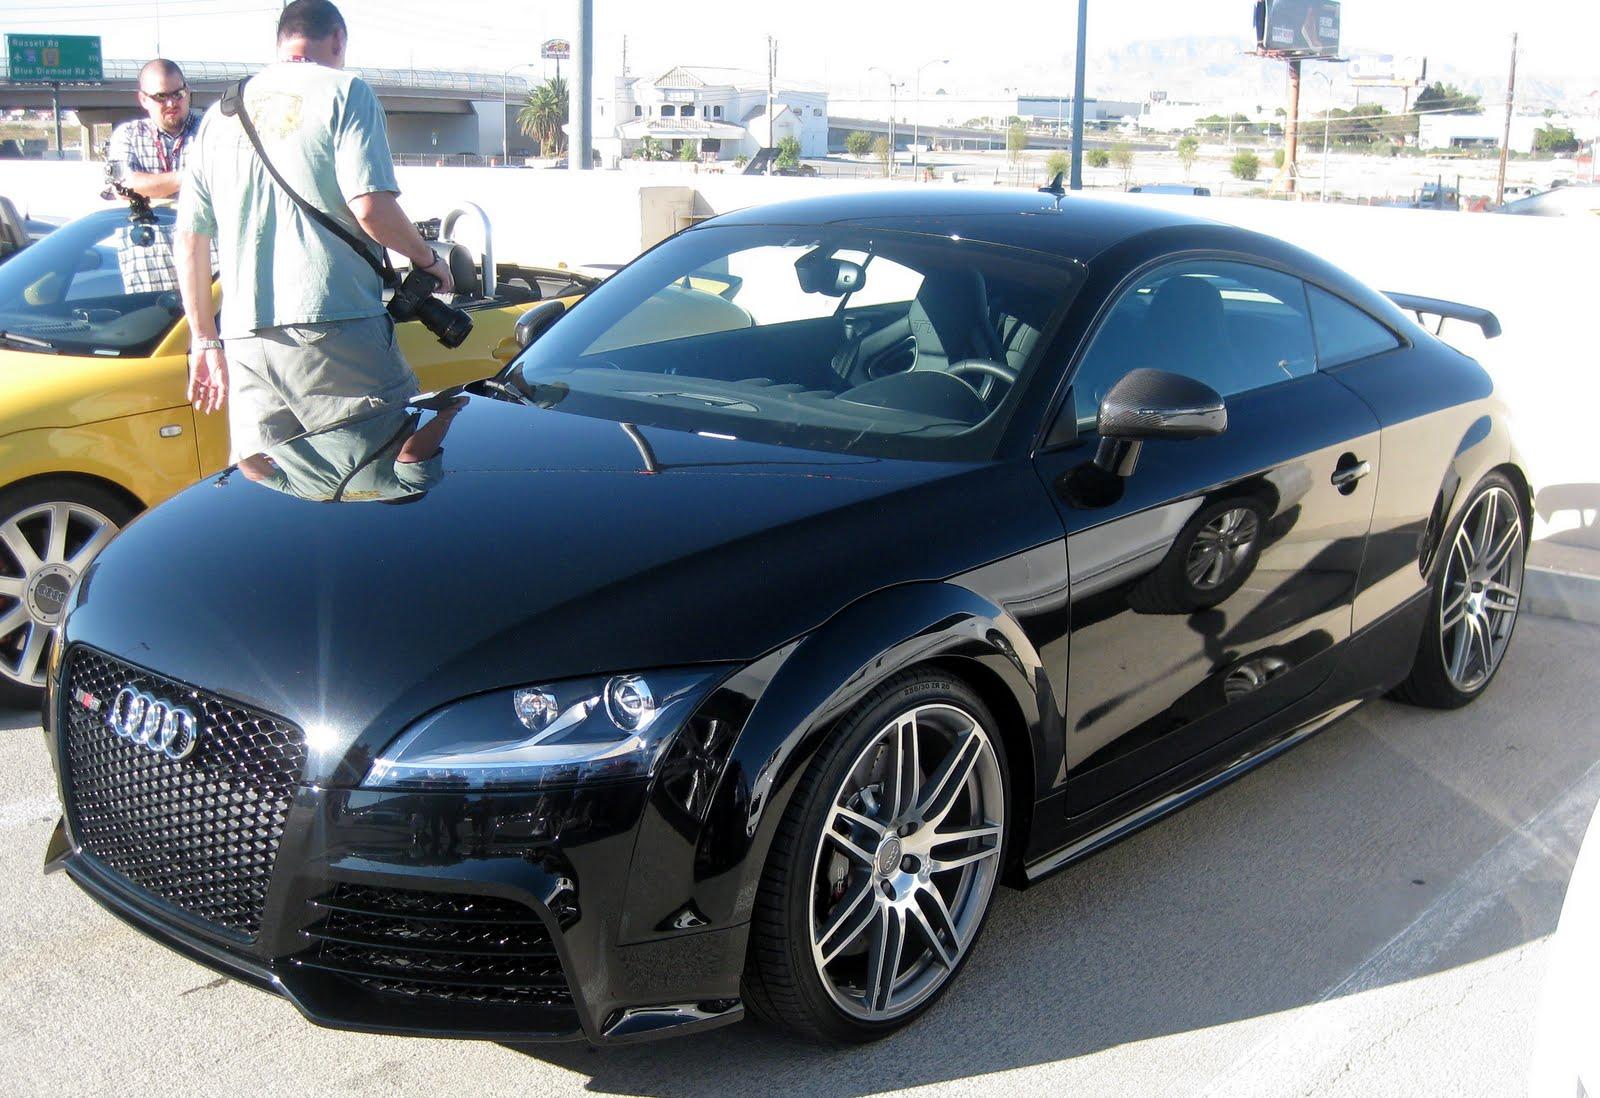 Audi TT Original Fredytt Aka FT Blog Los Angeles CA - Audi usa models